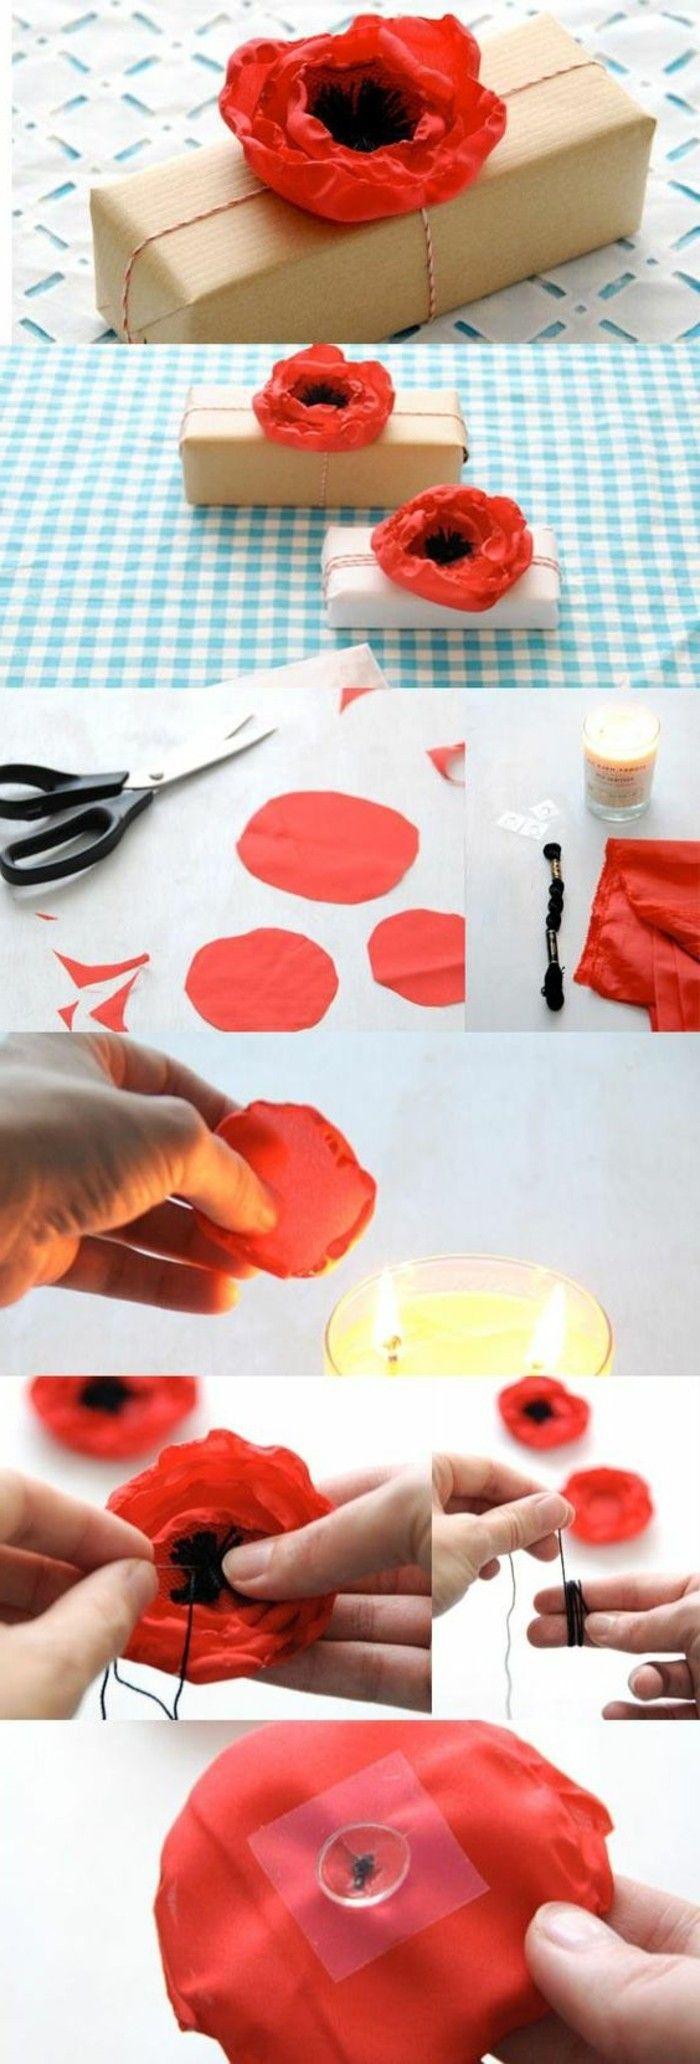 1001 id es comment faire des fleurs en tissu impressionnantes fleurs en tissu. Black Bedroom Furniture Sets. Home Design Ideas